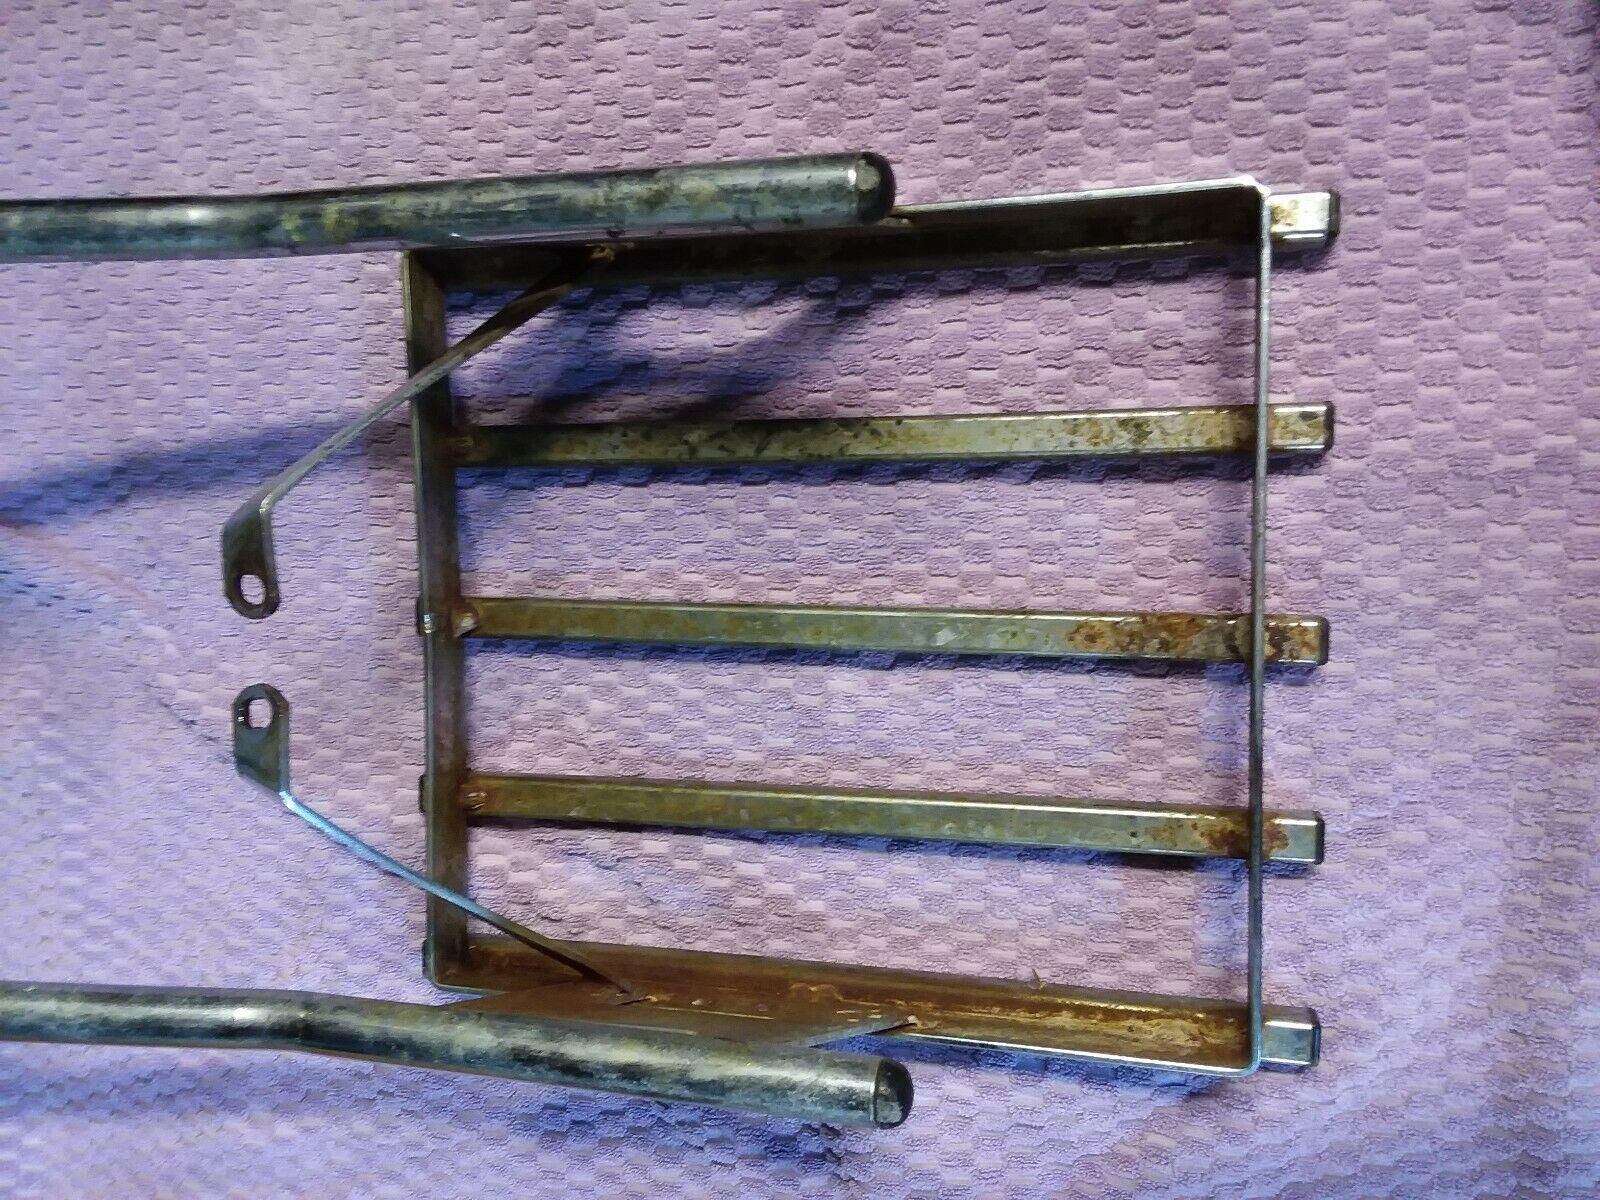 72-73 CL 350 luggage rack fit a 68-luggage.rack2.jpg